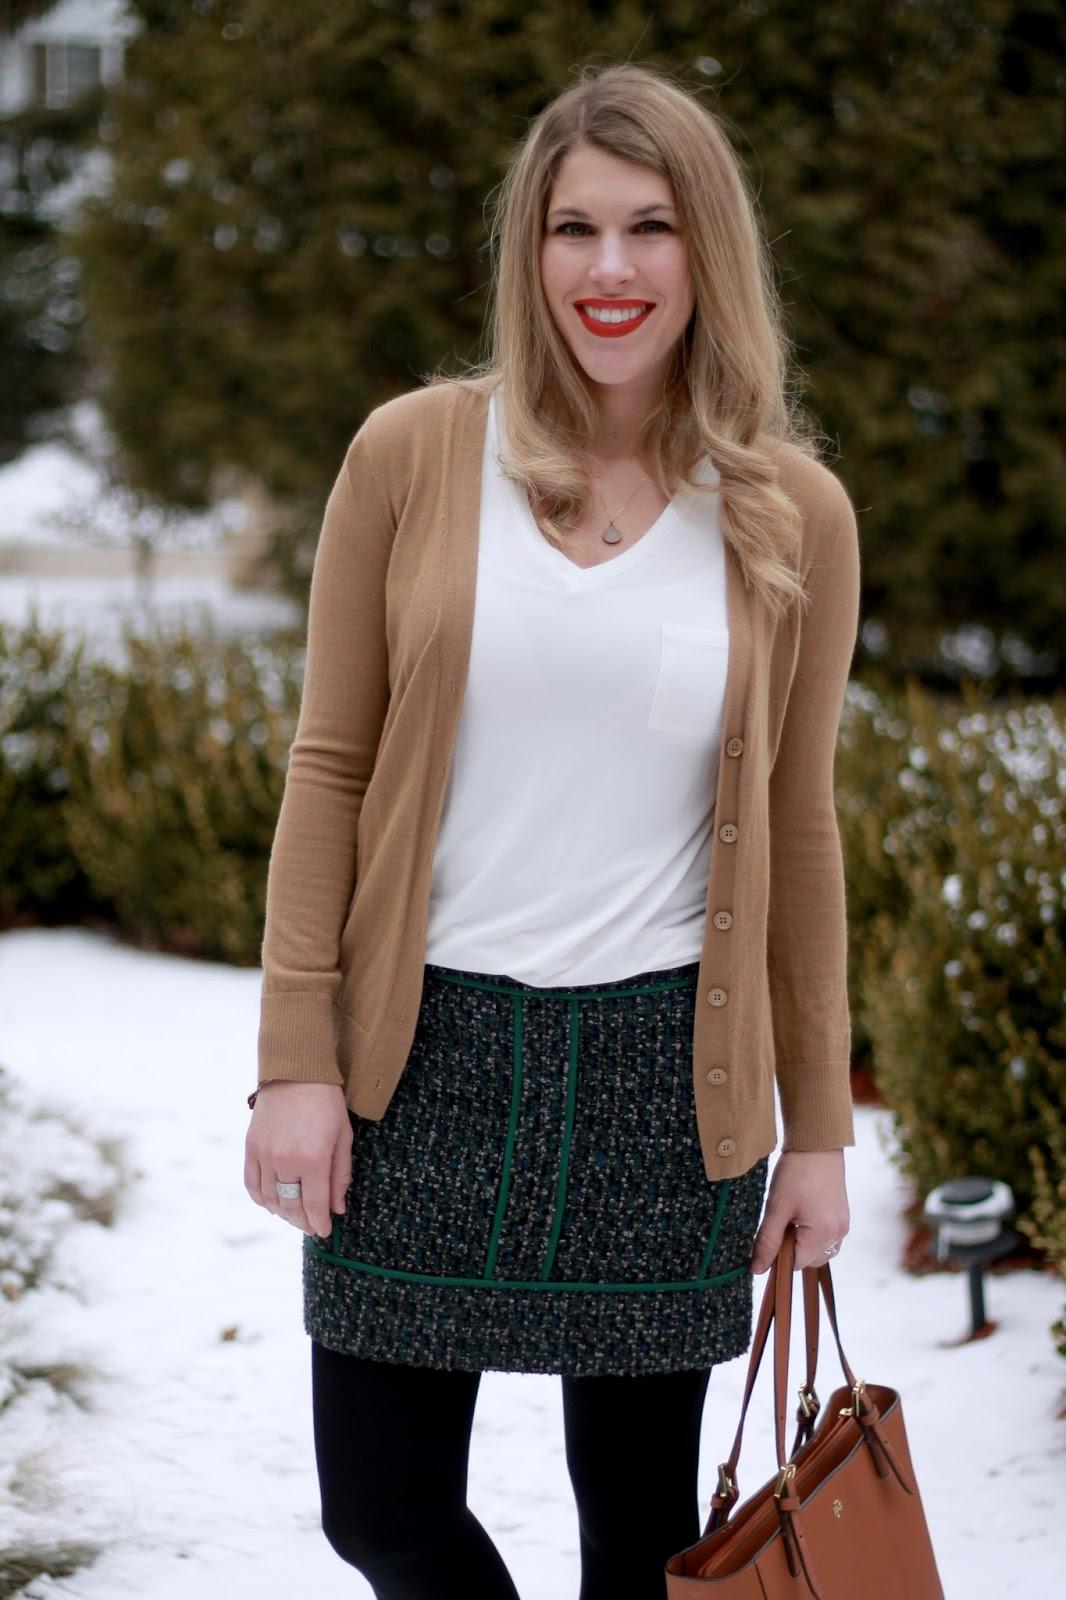 white tee, camel cardigan, green tweed skirt, 4Eursole oxfords